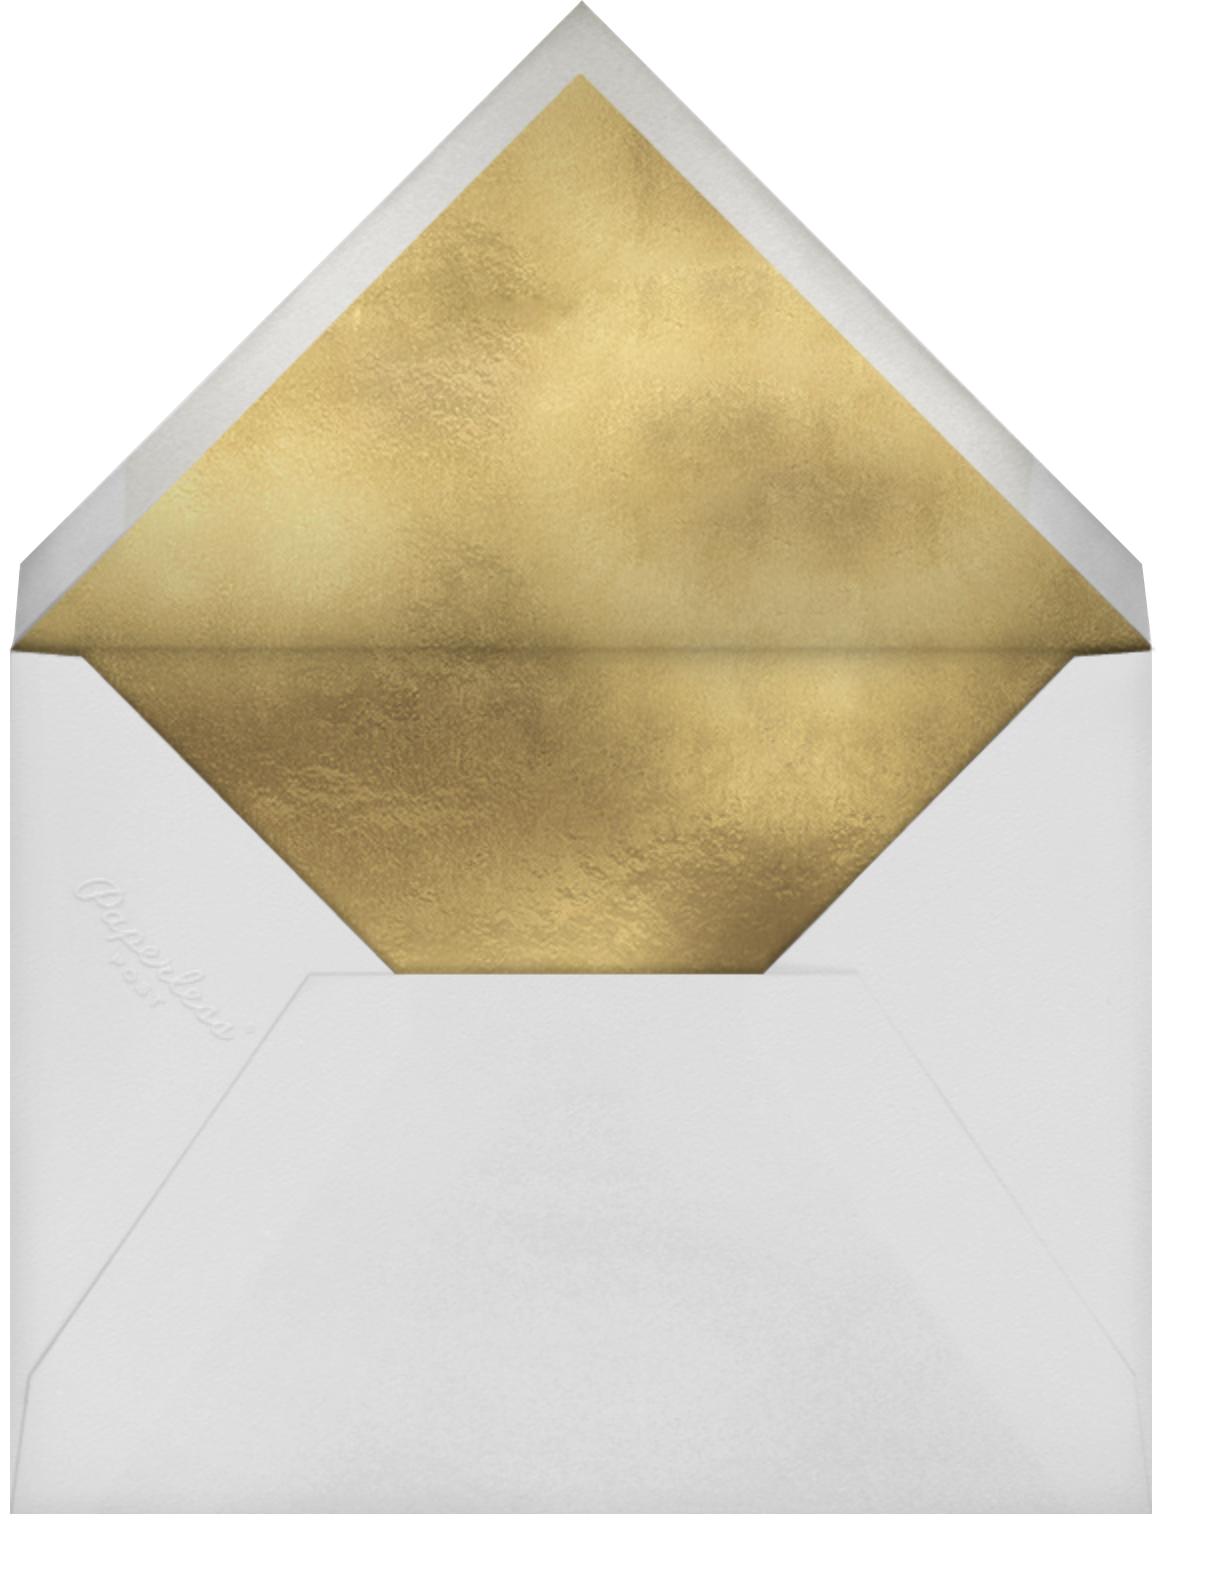 Ethereal Wash - Ashley G - Baby shower - envelope back